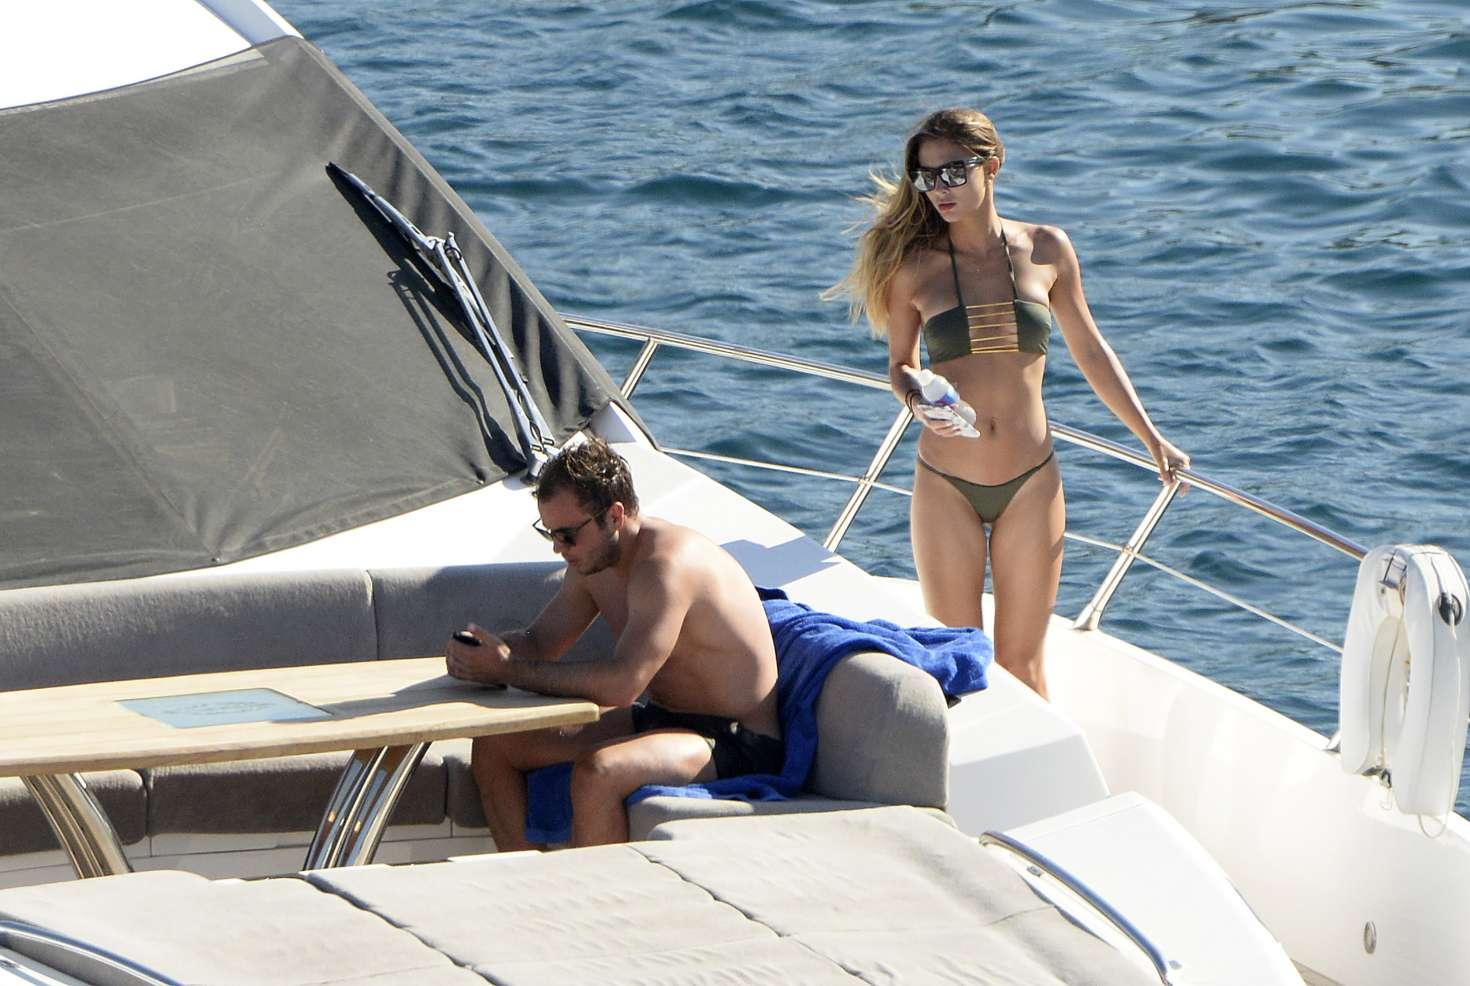 Ann-Kathrin Brommel 2017 : Ann-Kathrin Brommel: Hot in a bikini while on a yacht in Mallorca-09